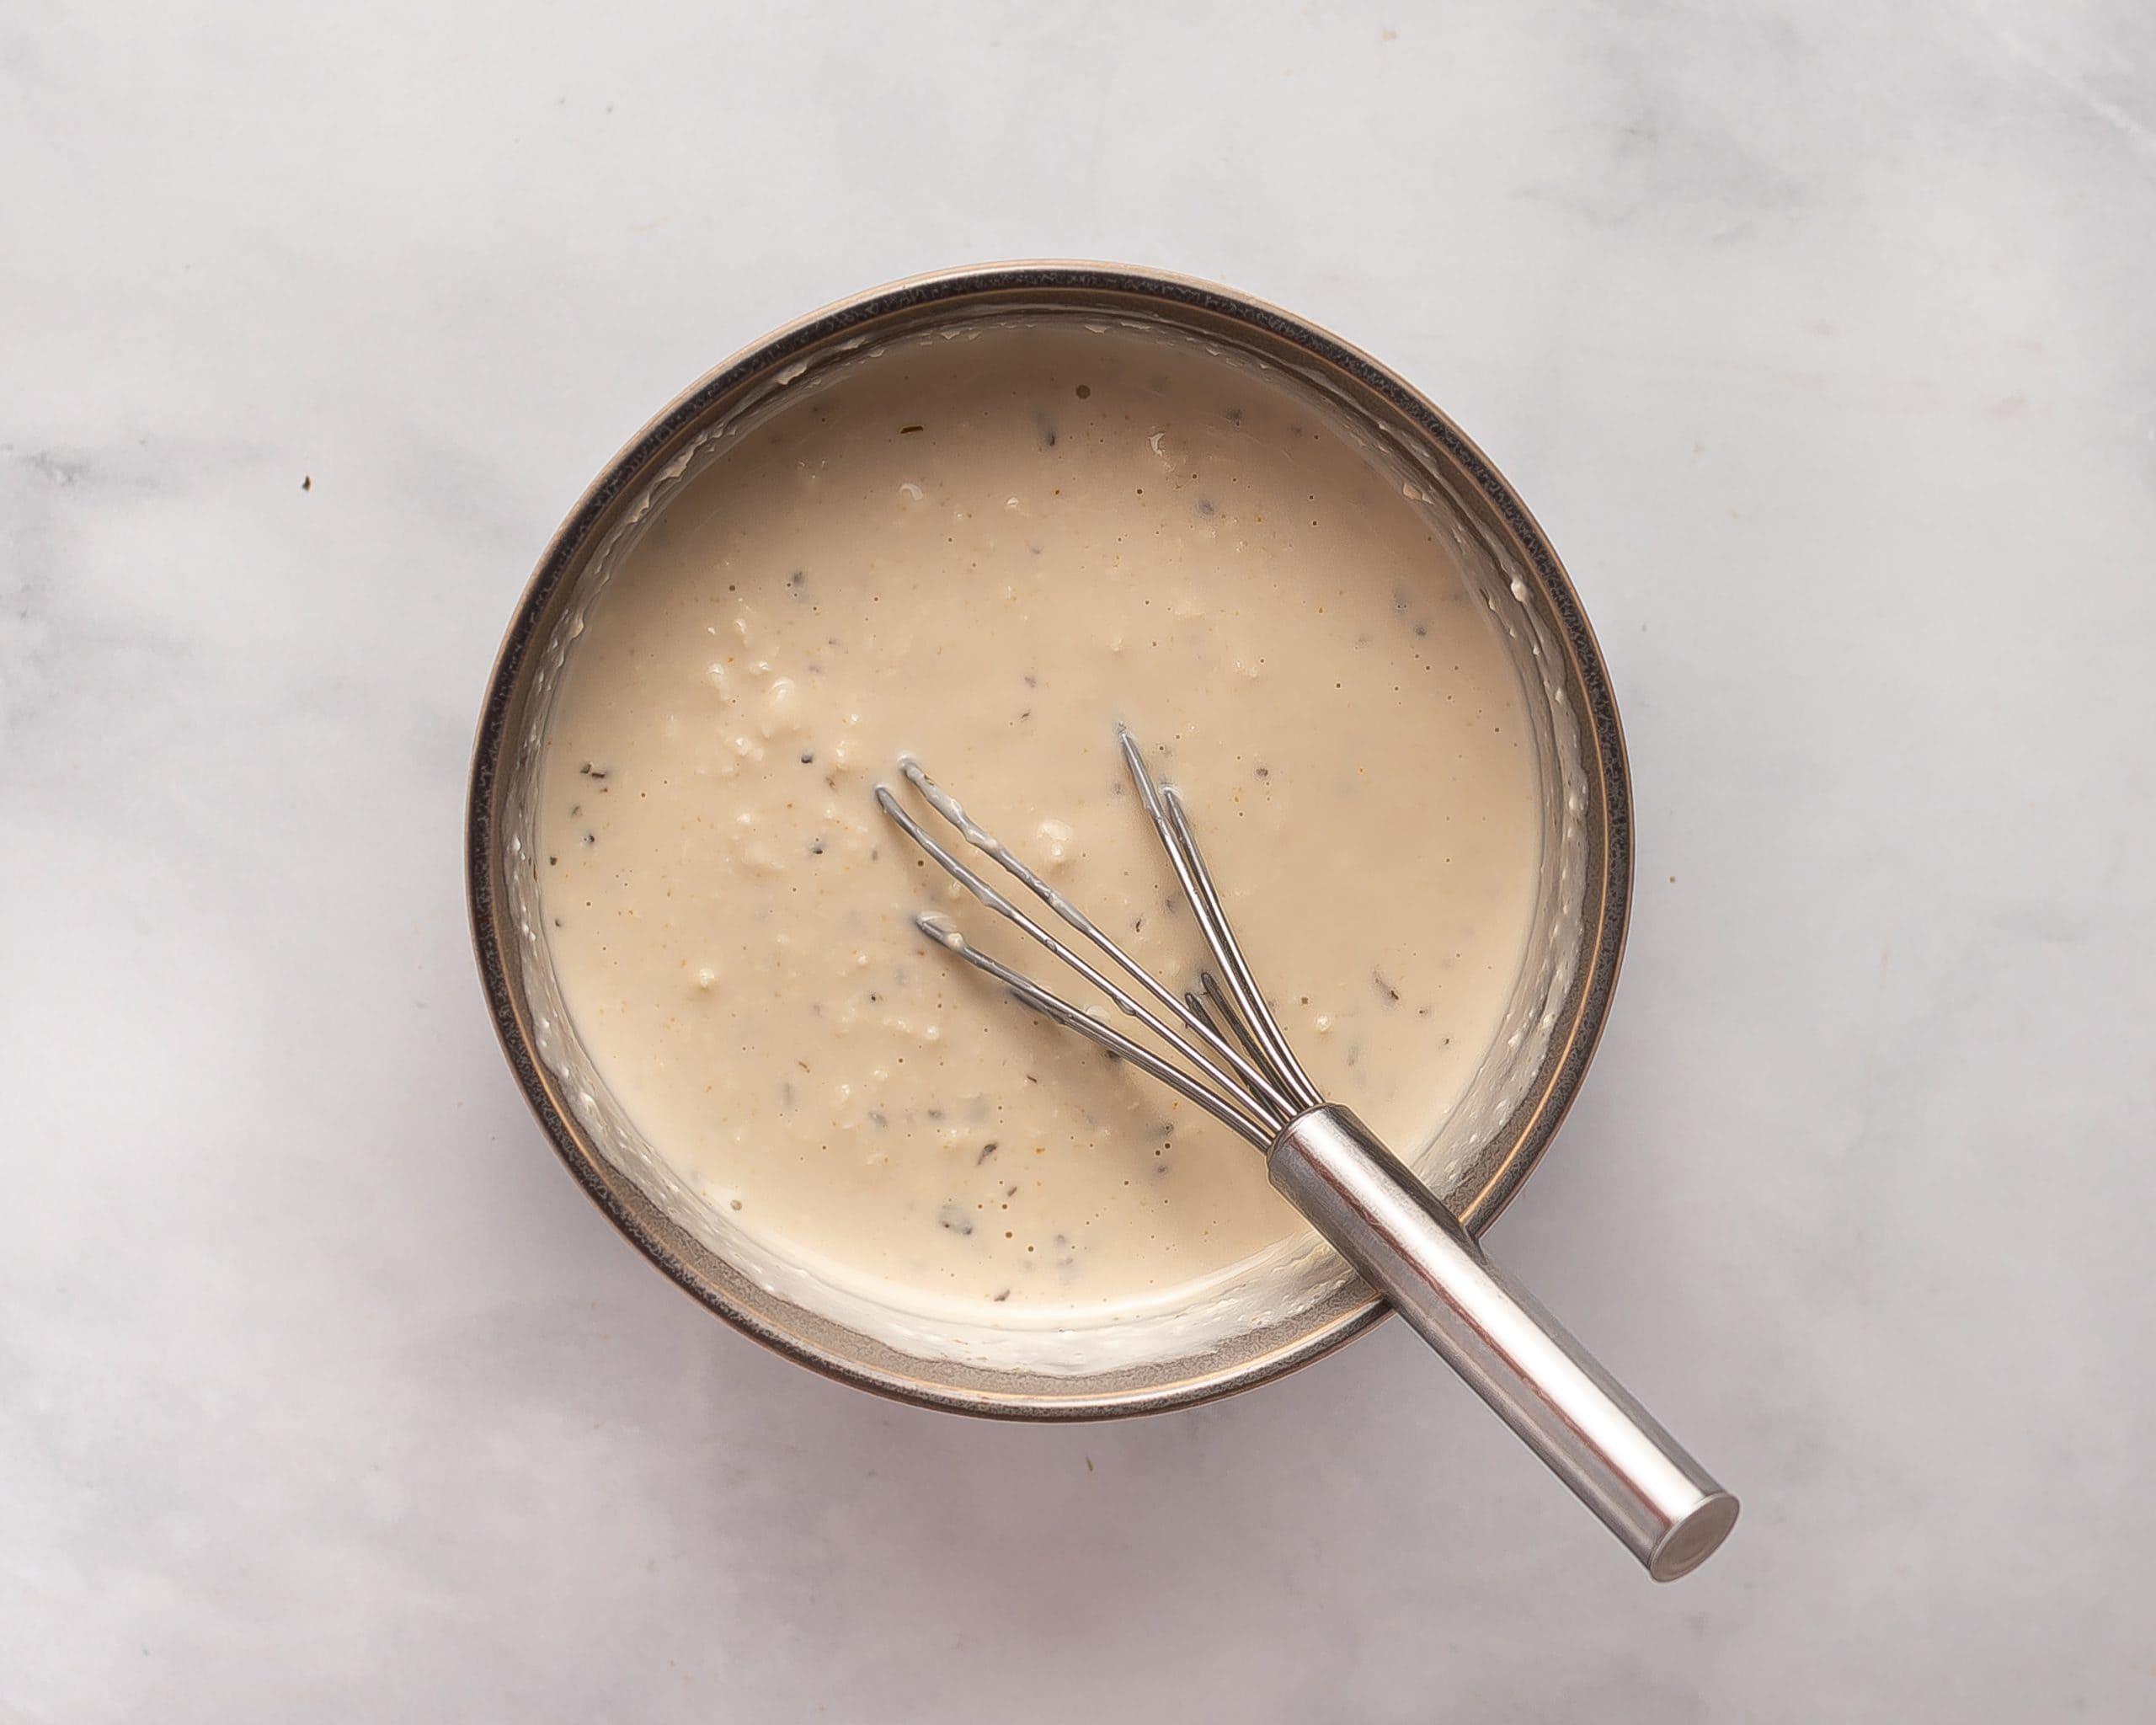 bowl with Prepared vegan blue cheese dip for seitan wings